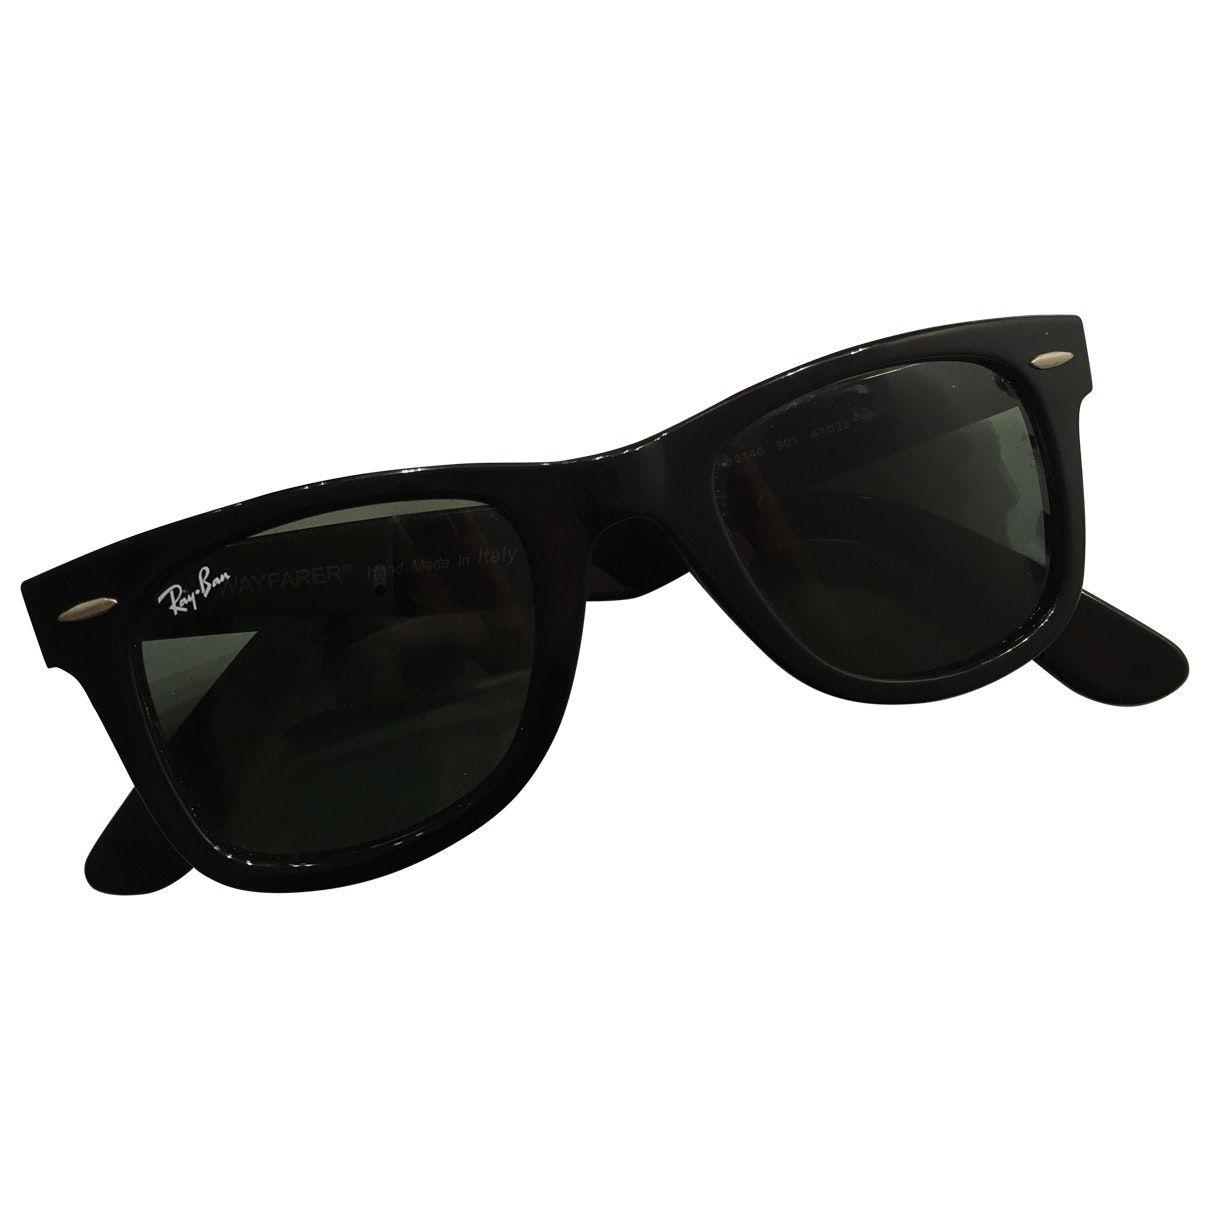 52a34cbe47 Sunglasses in 2019